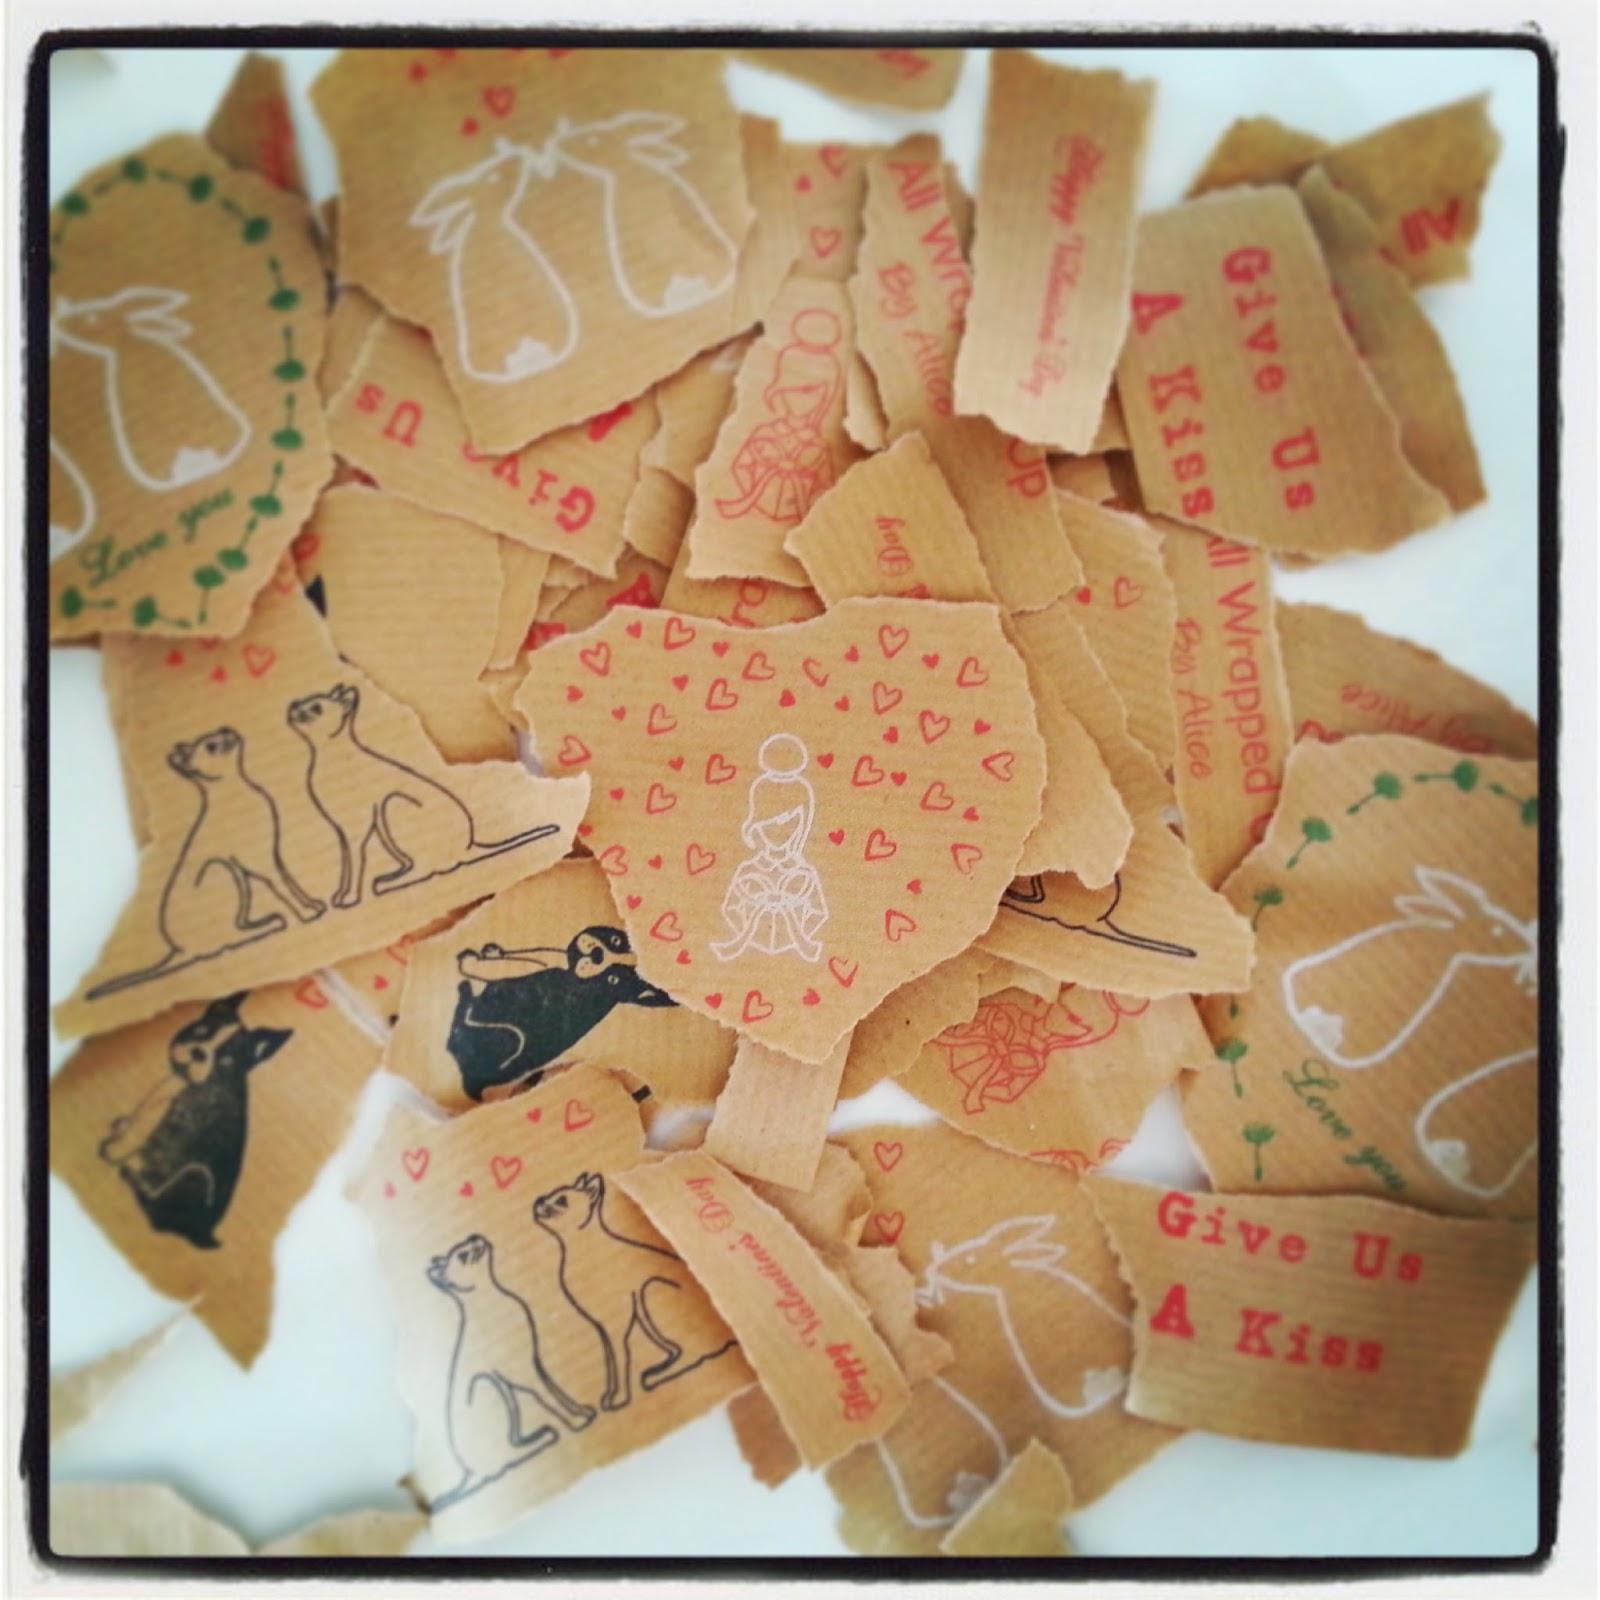 http://www.wrappedbyalice.co.uk/blog/4587767085/DIY-Decoupage-Heart/9393860